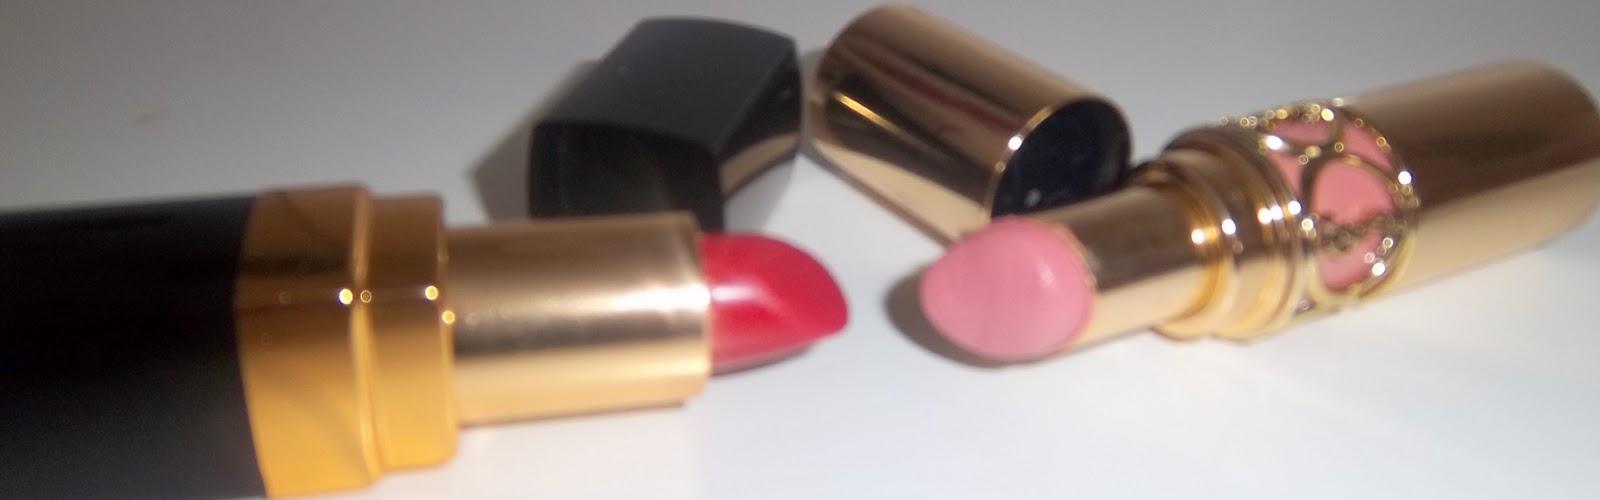 BLOG Review - Chanel Lipstick VS YSL Lipstick